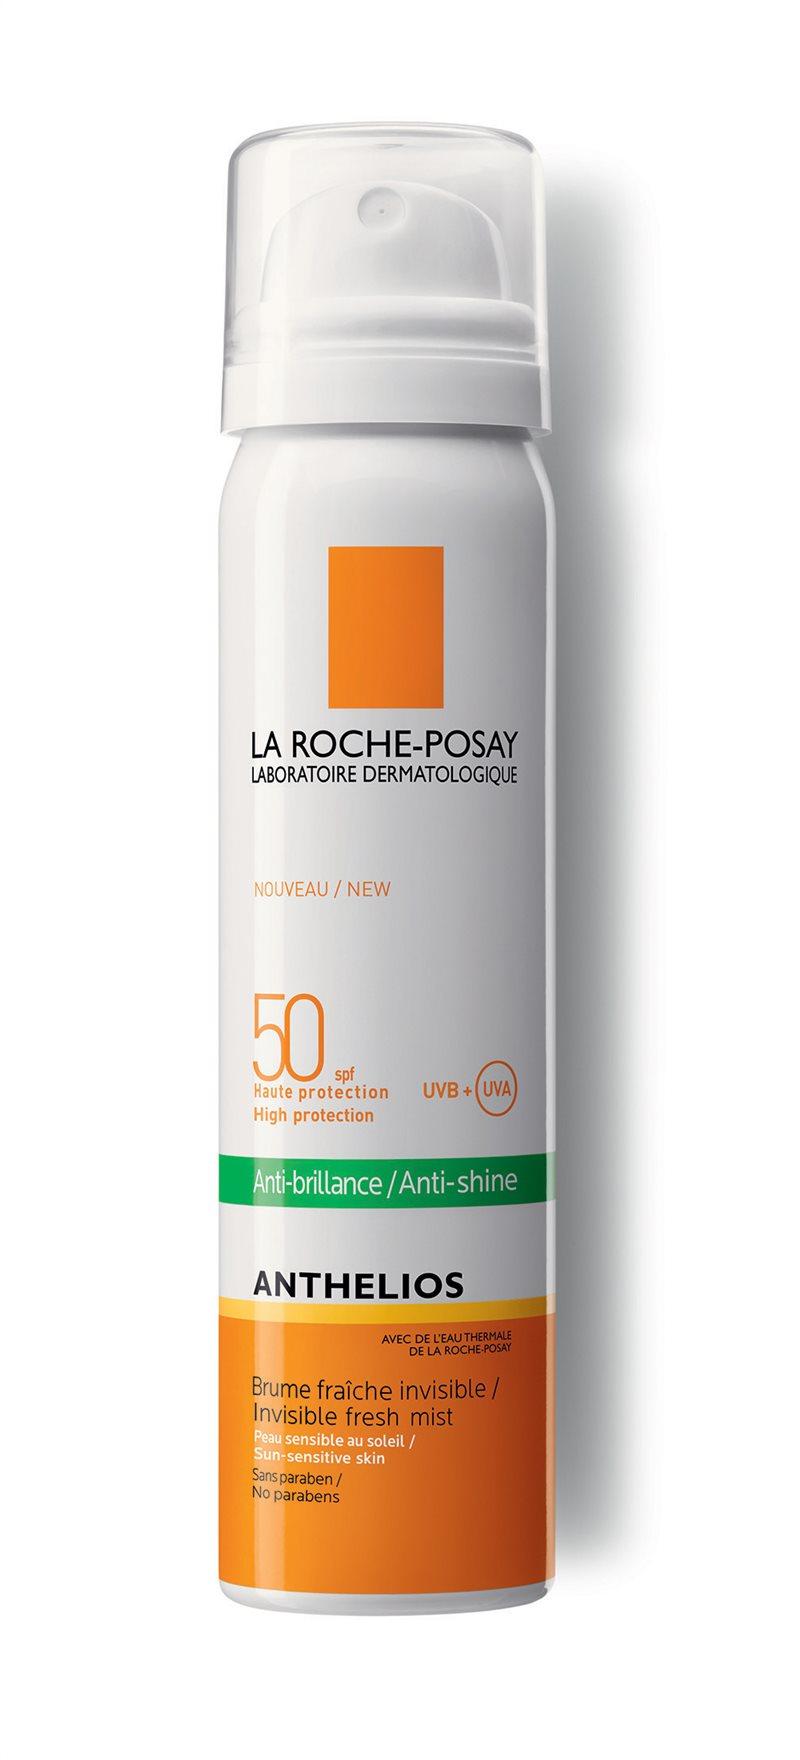 La Roche Posay Anthelios Mist SPF 50